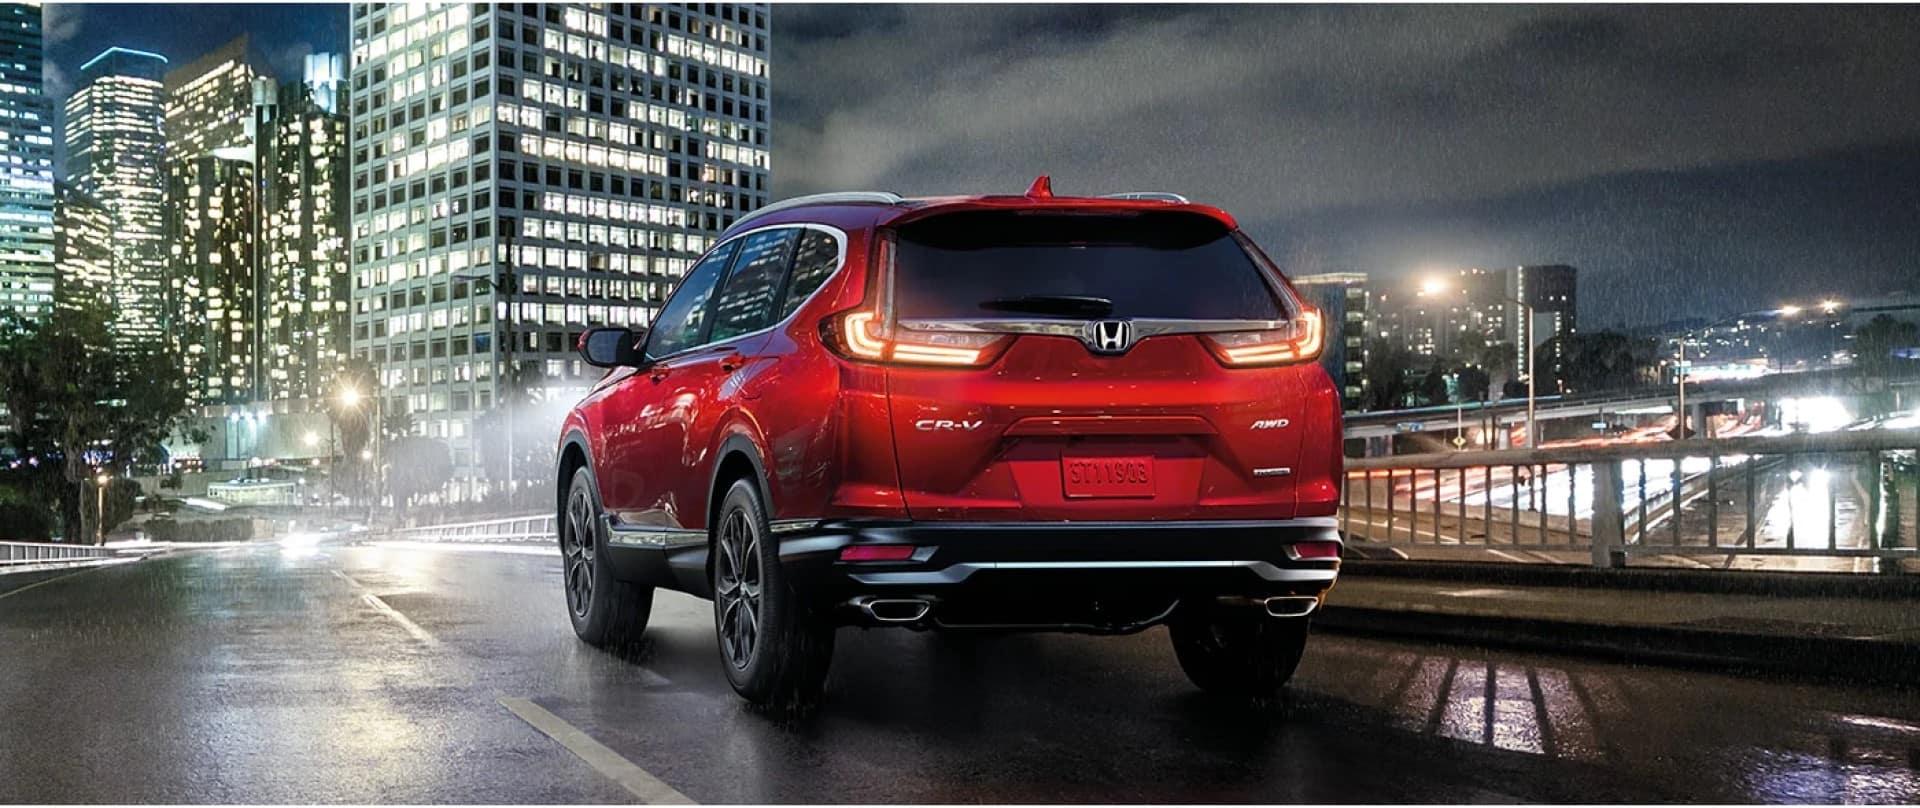 Honda_CR-V_Parked_Cityscape